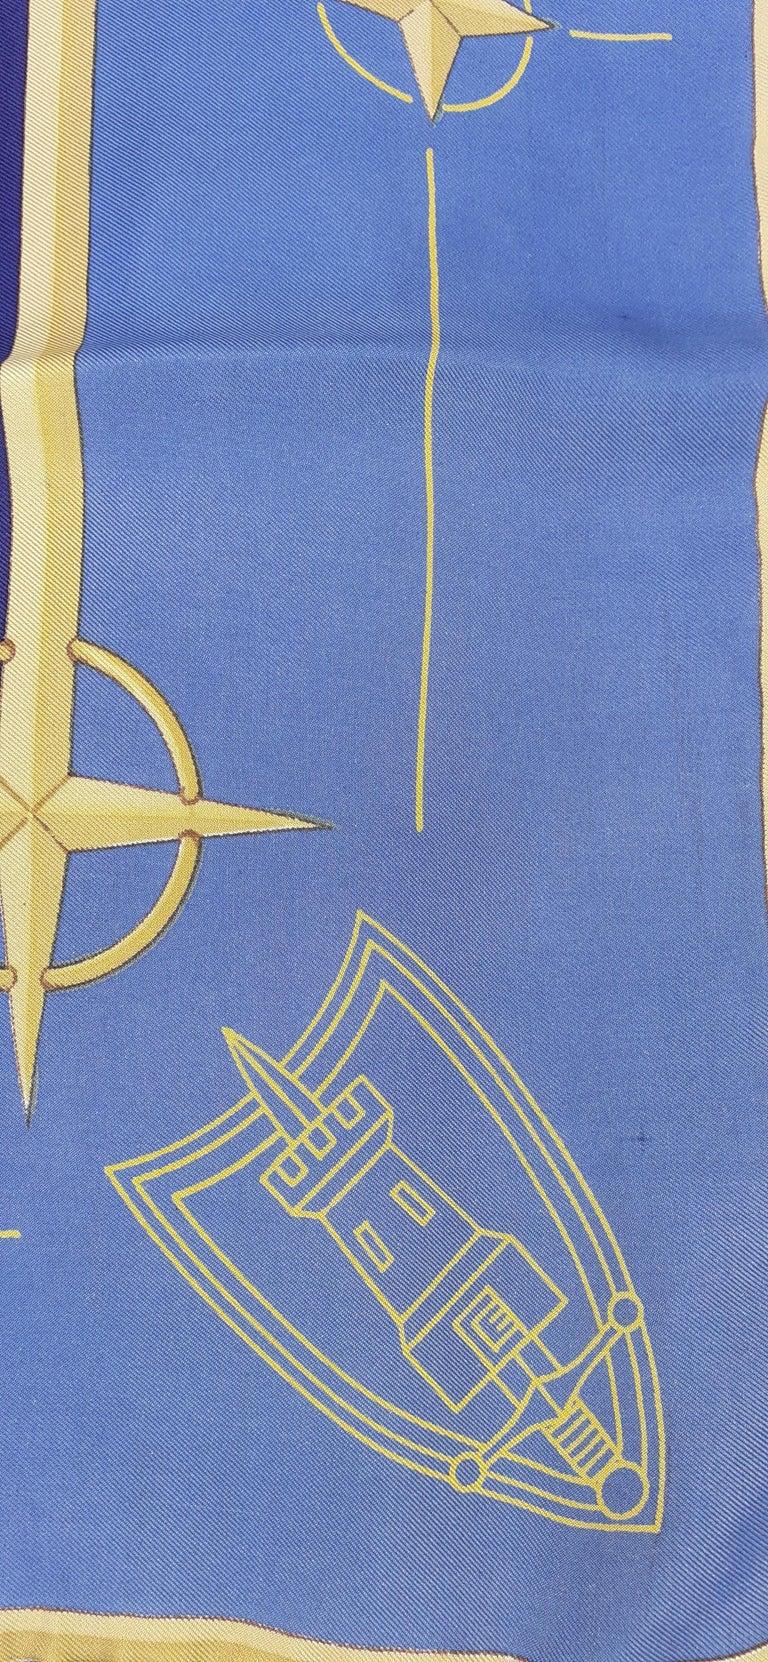 Exceptional Hermès Vintage Silk Scarf OTAN NATO Hugo Grygkar 1956 RARE For Sale 2